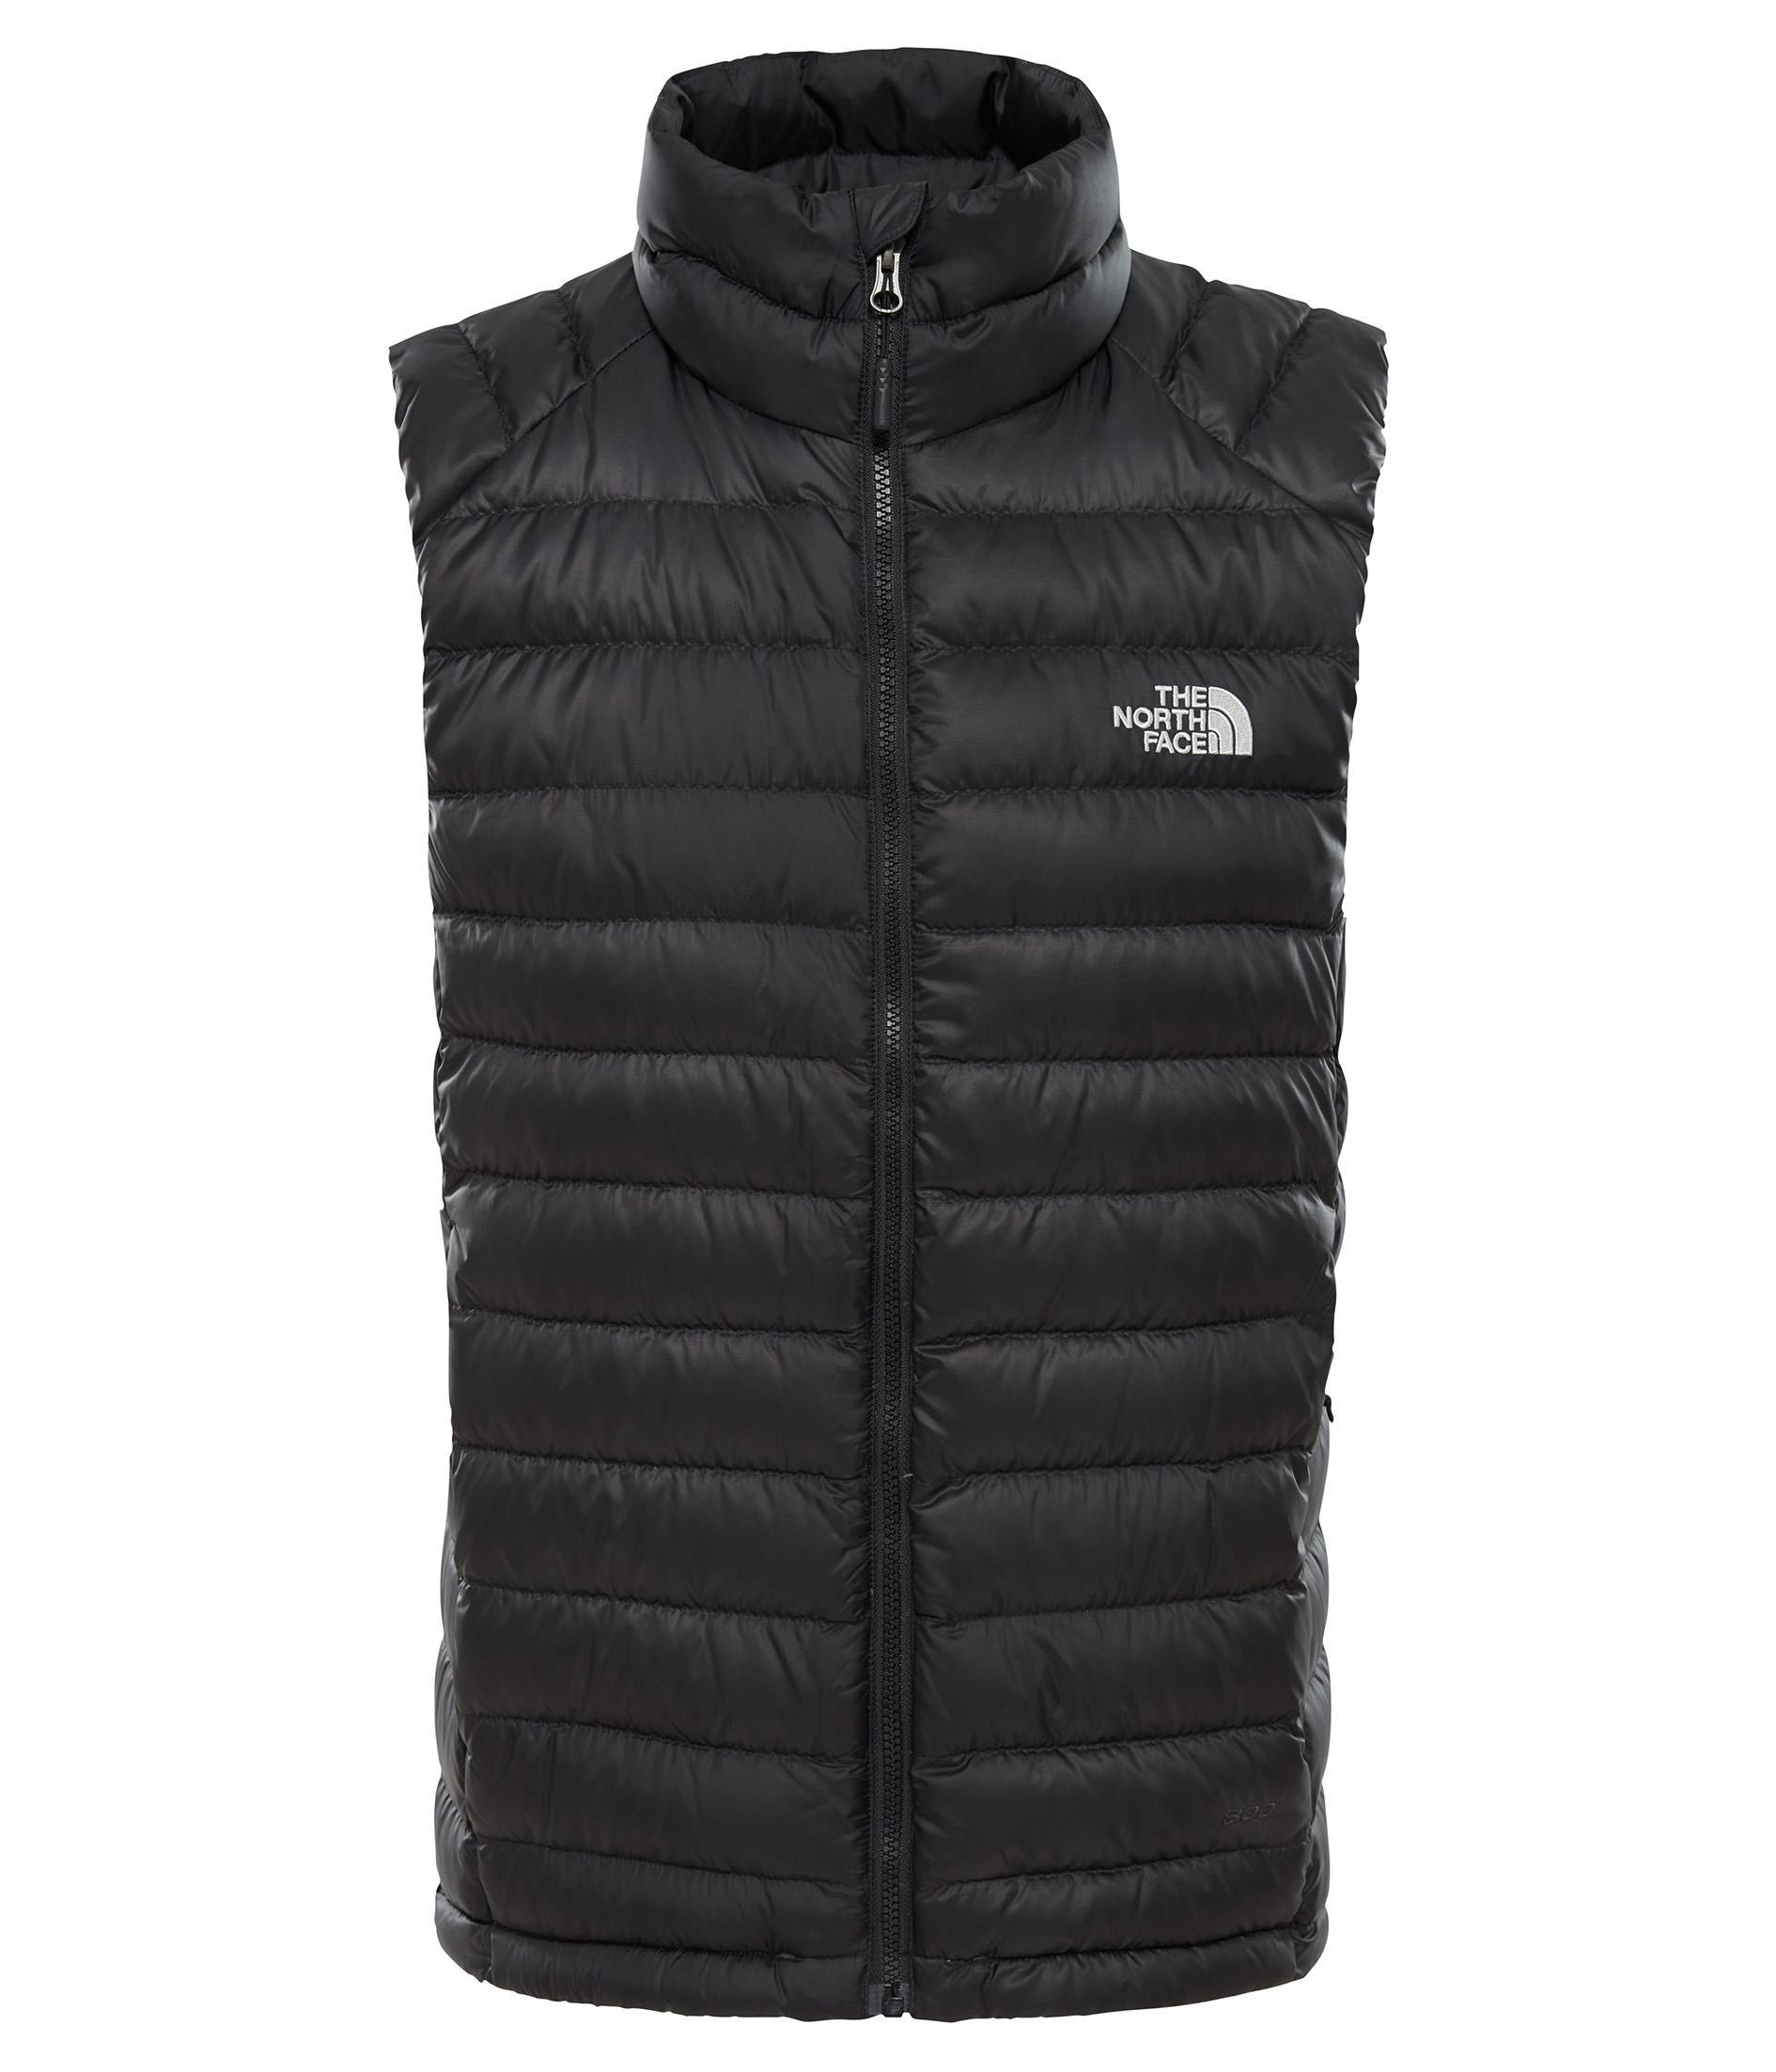 The North Face Erkek Trevaıl Vest Ceket